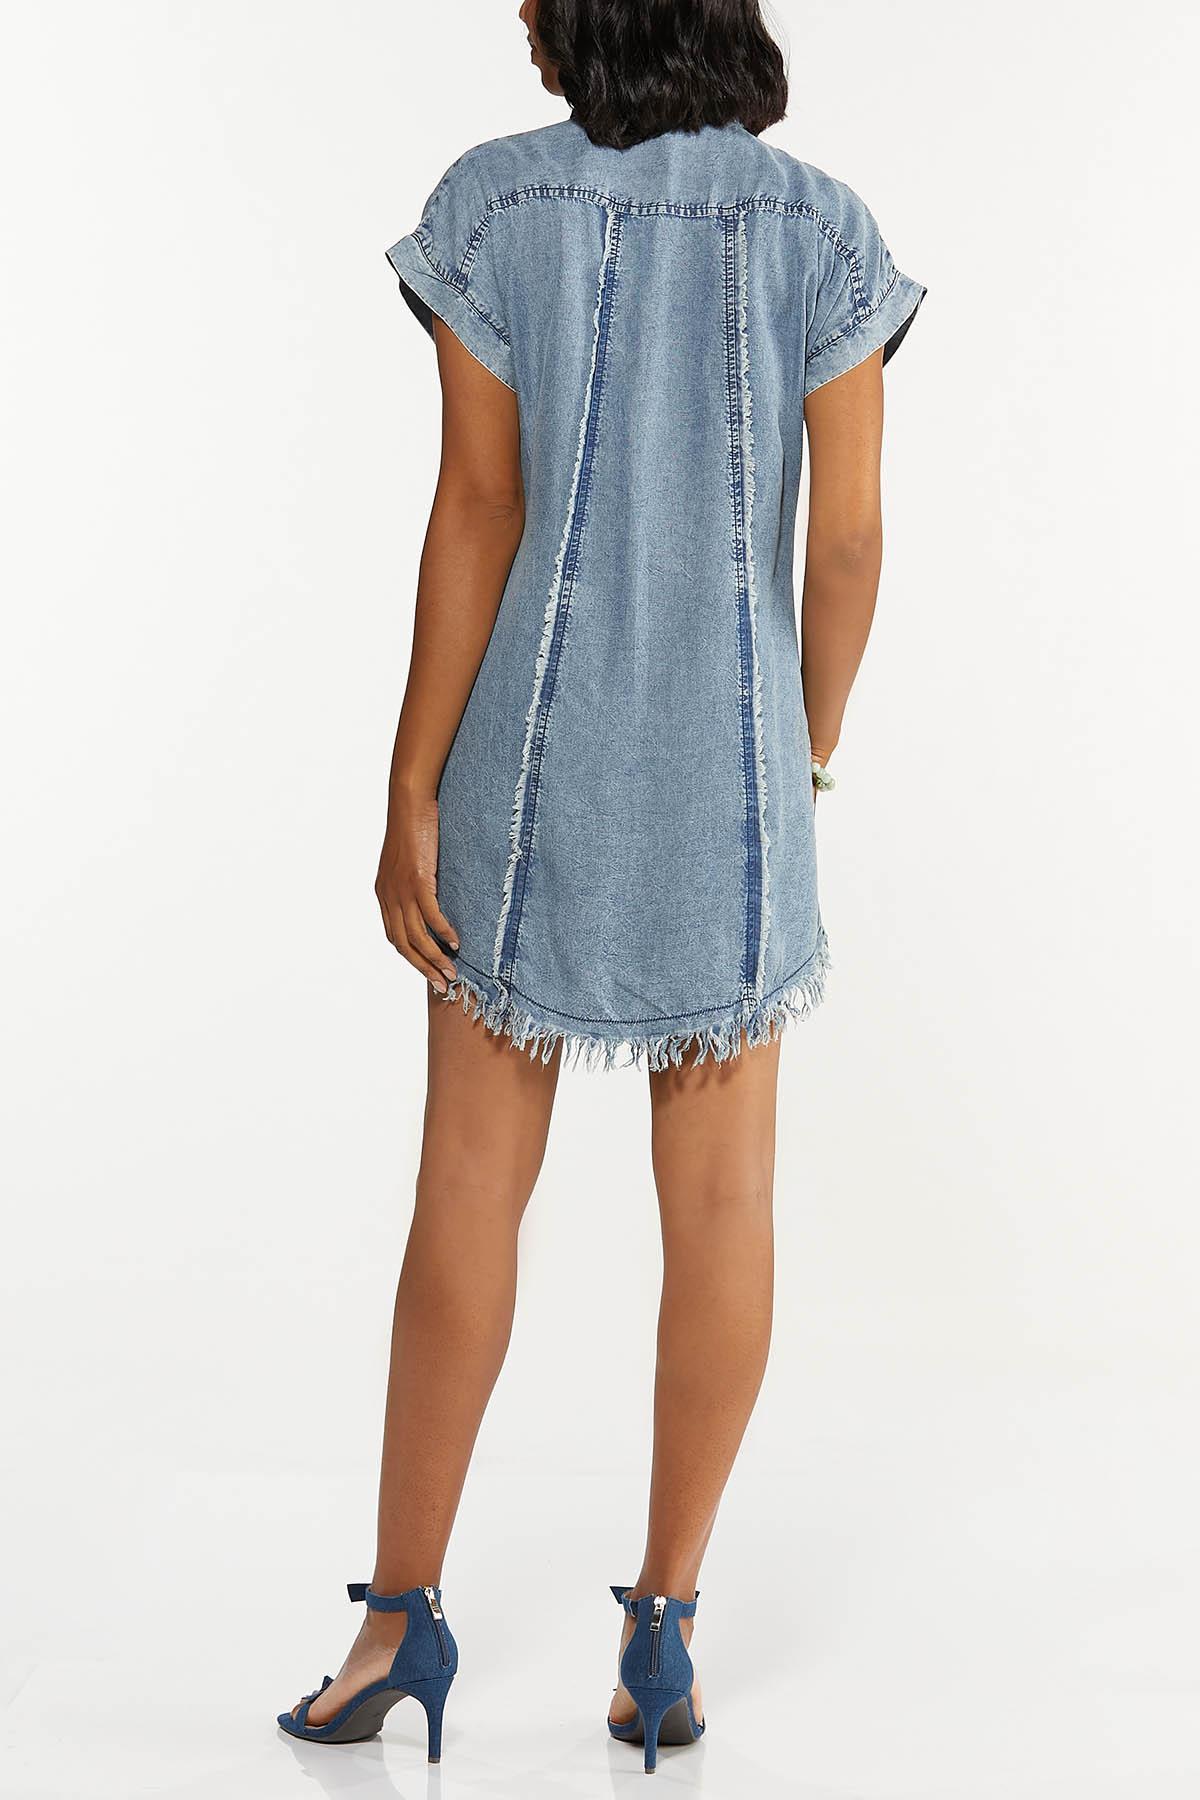 Frayed Chambray Dress (Item #44658727)